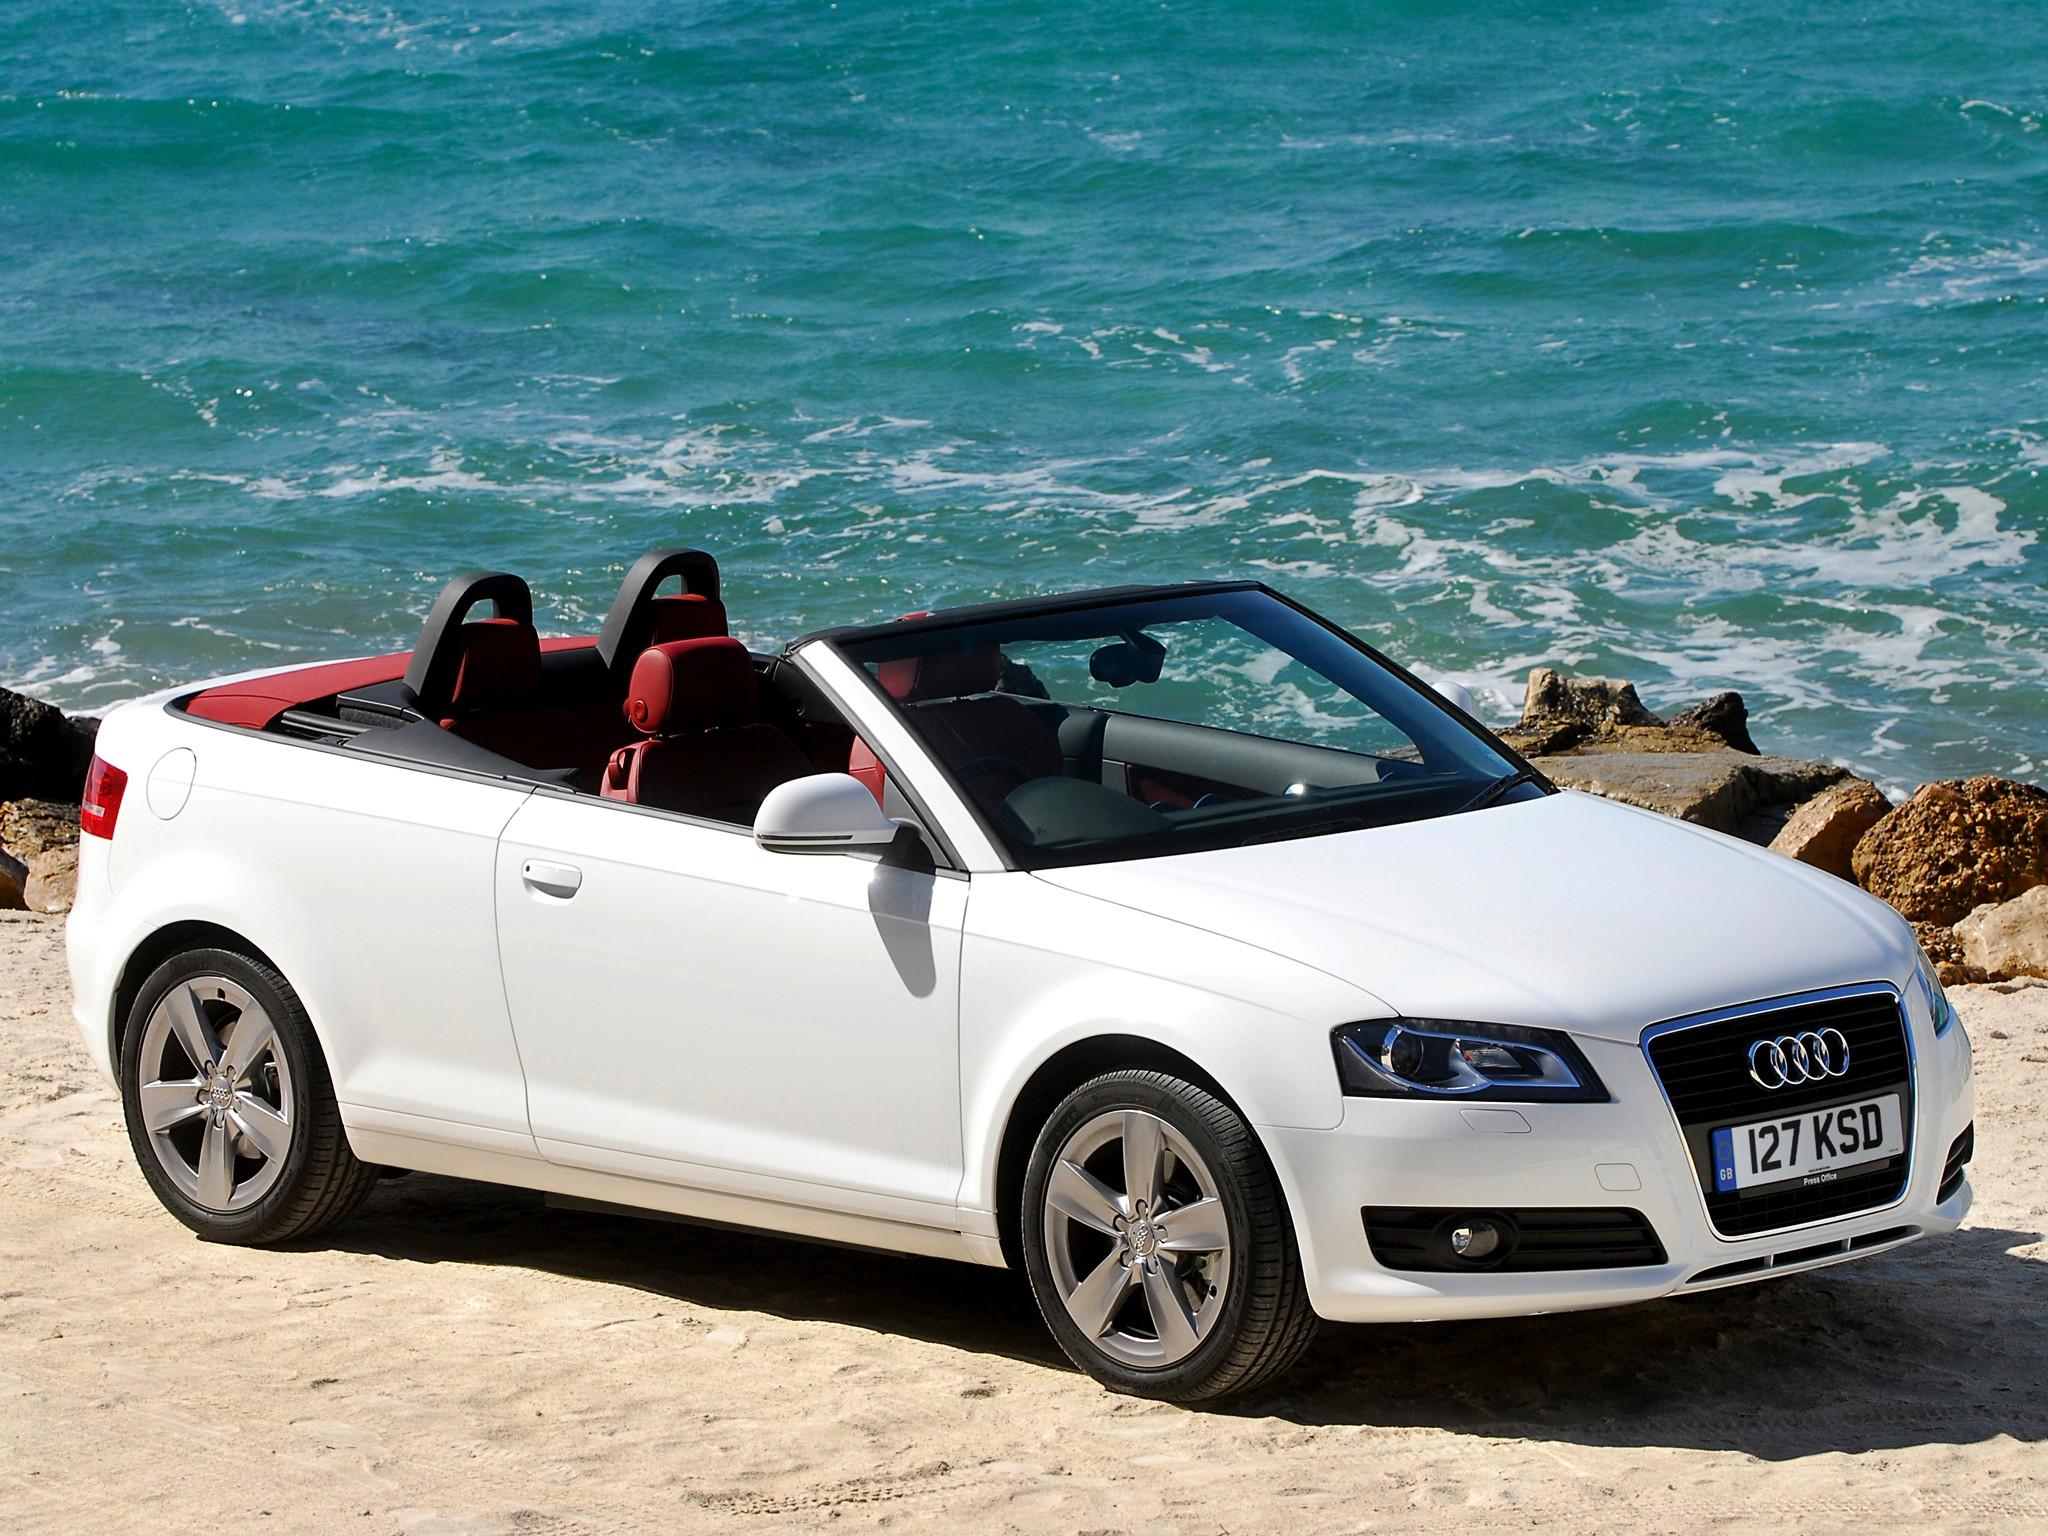 Audi A3 Cabriolet Specs 2008 2009 2010 2011 2012